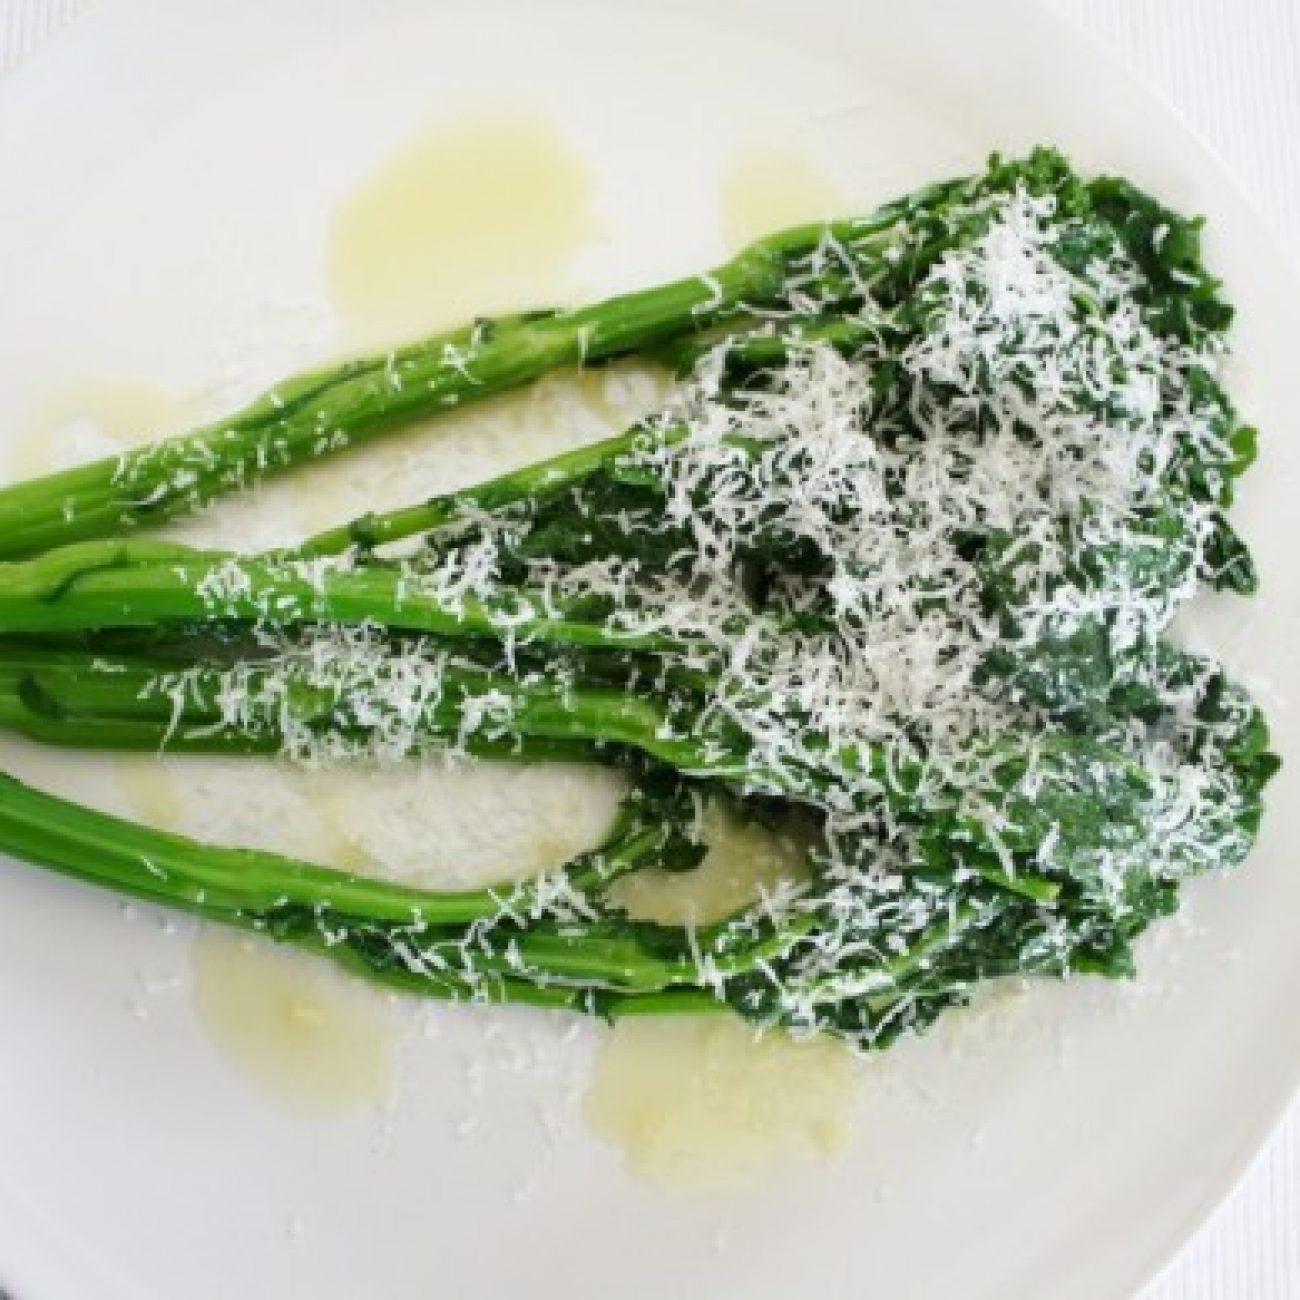 Broccoli Rabe My Style!